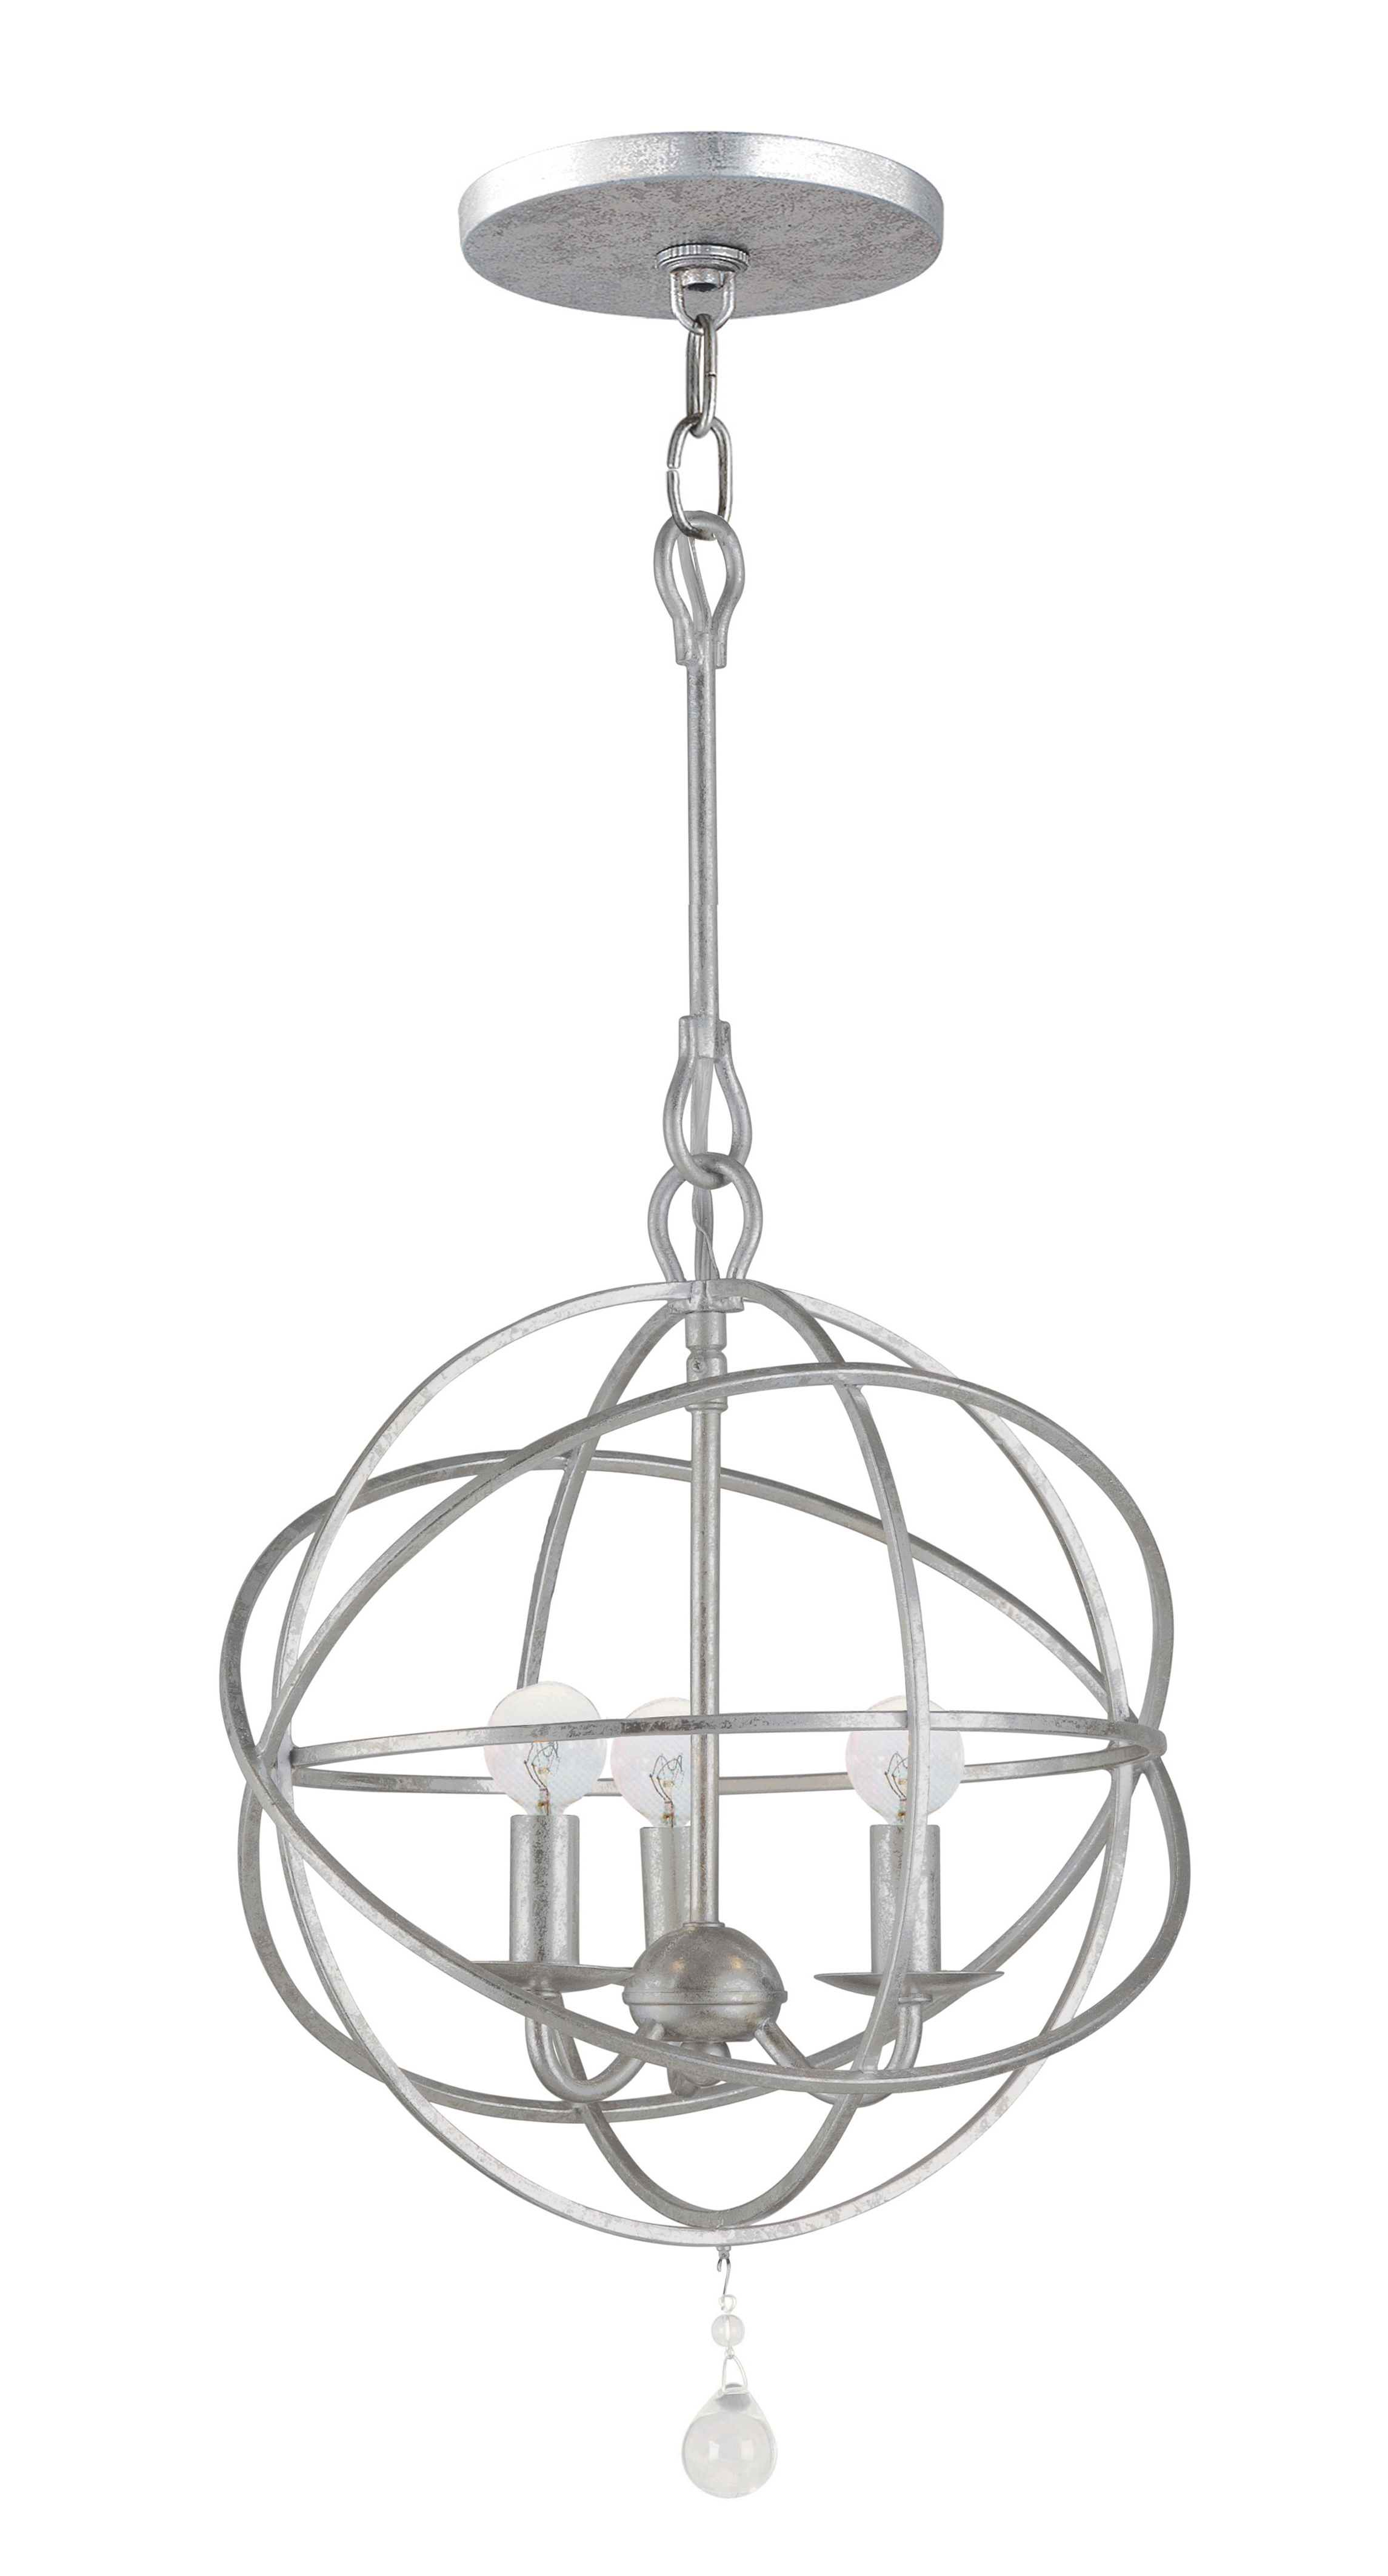 Gregoire 3 Light Globe Chandelier Within 2020 Alden 3 Light Single Globe Pendants (View 13 of 20)